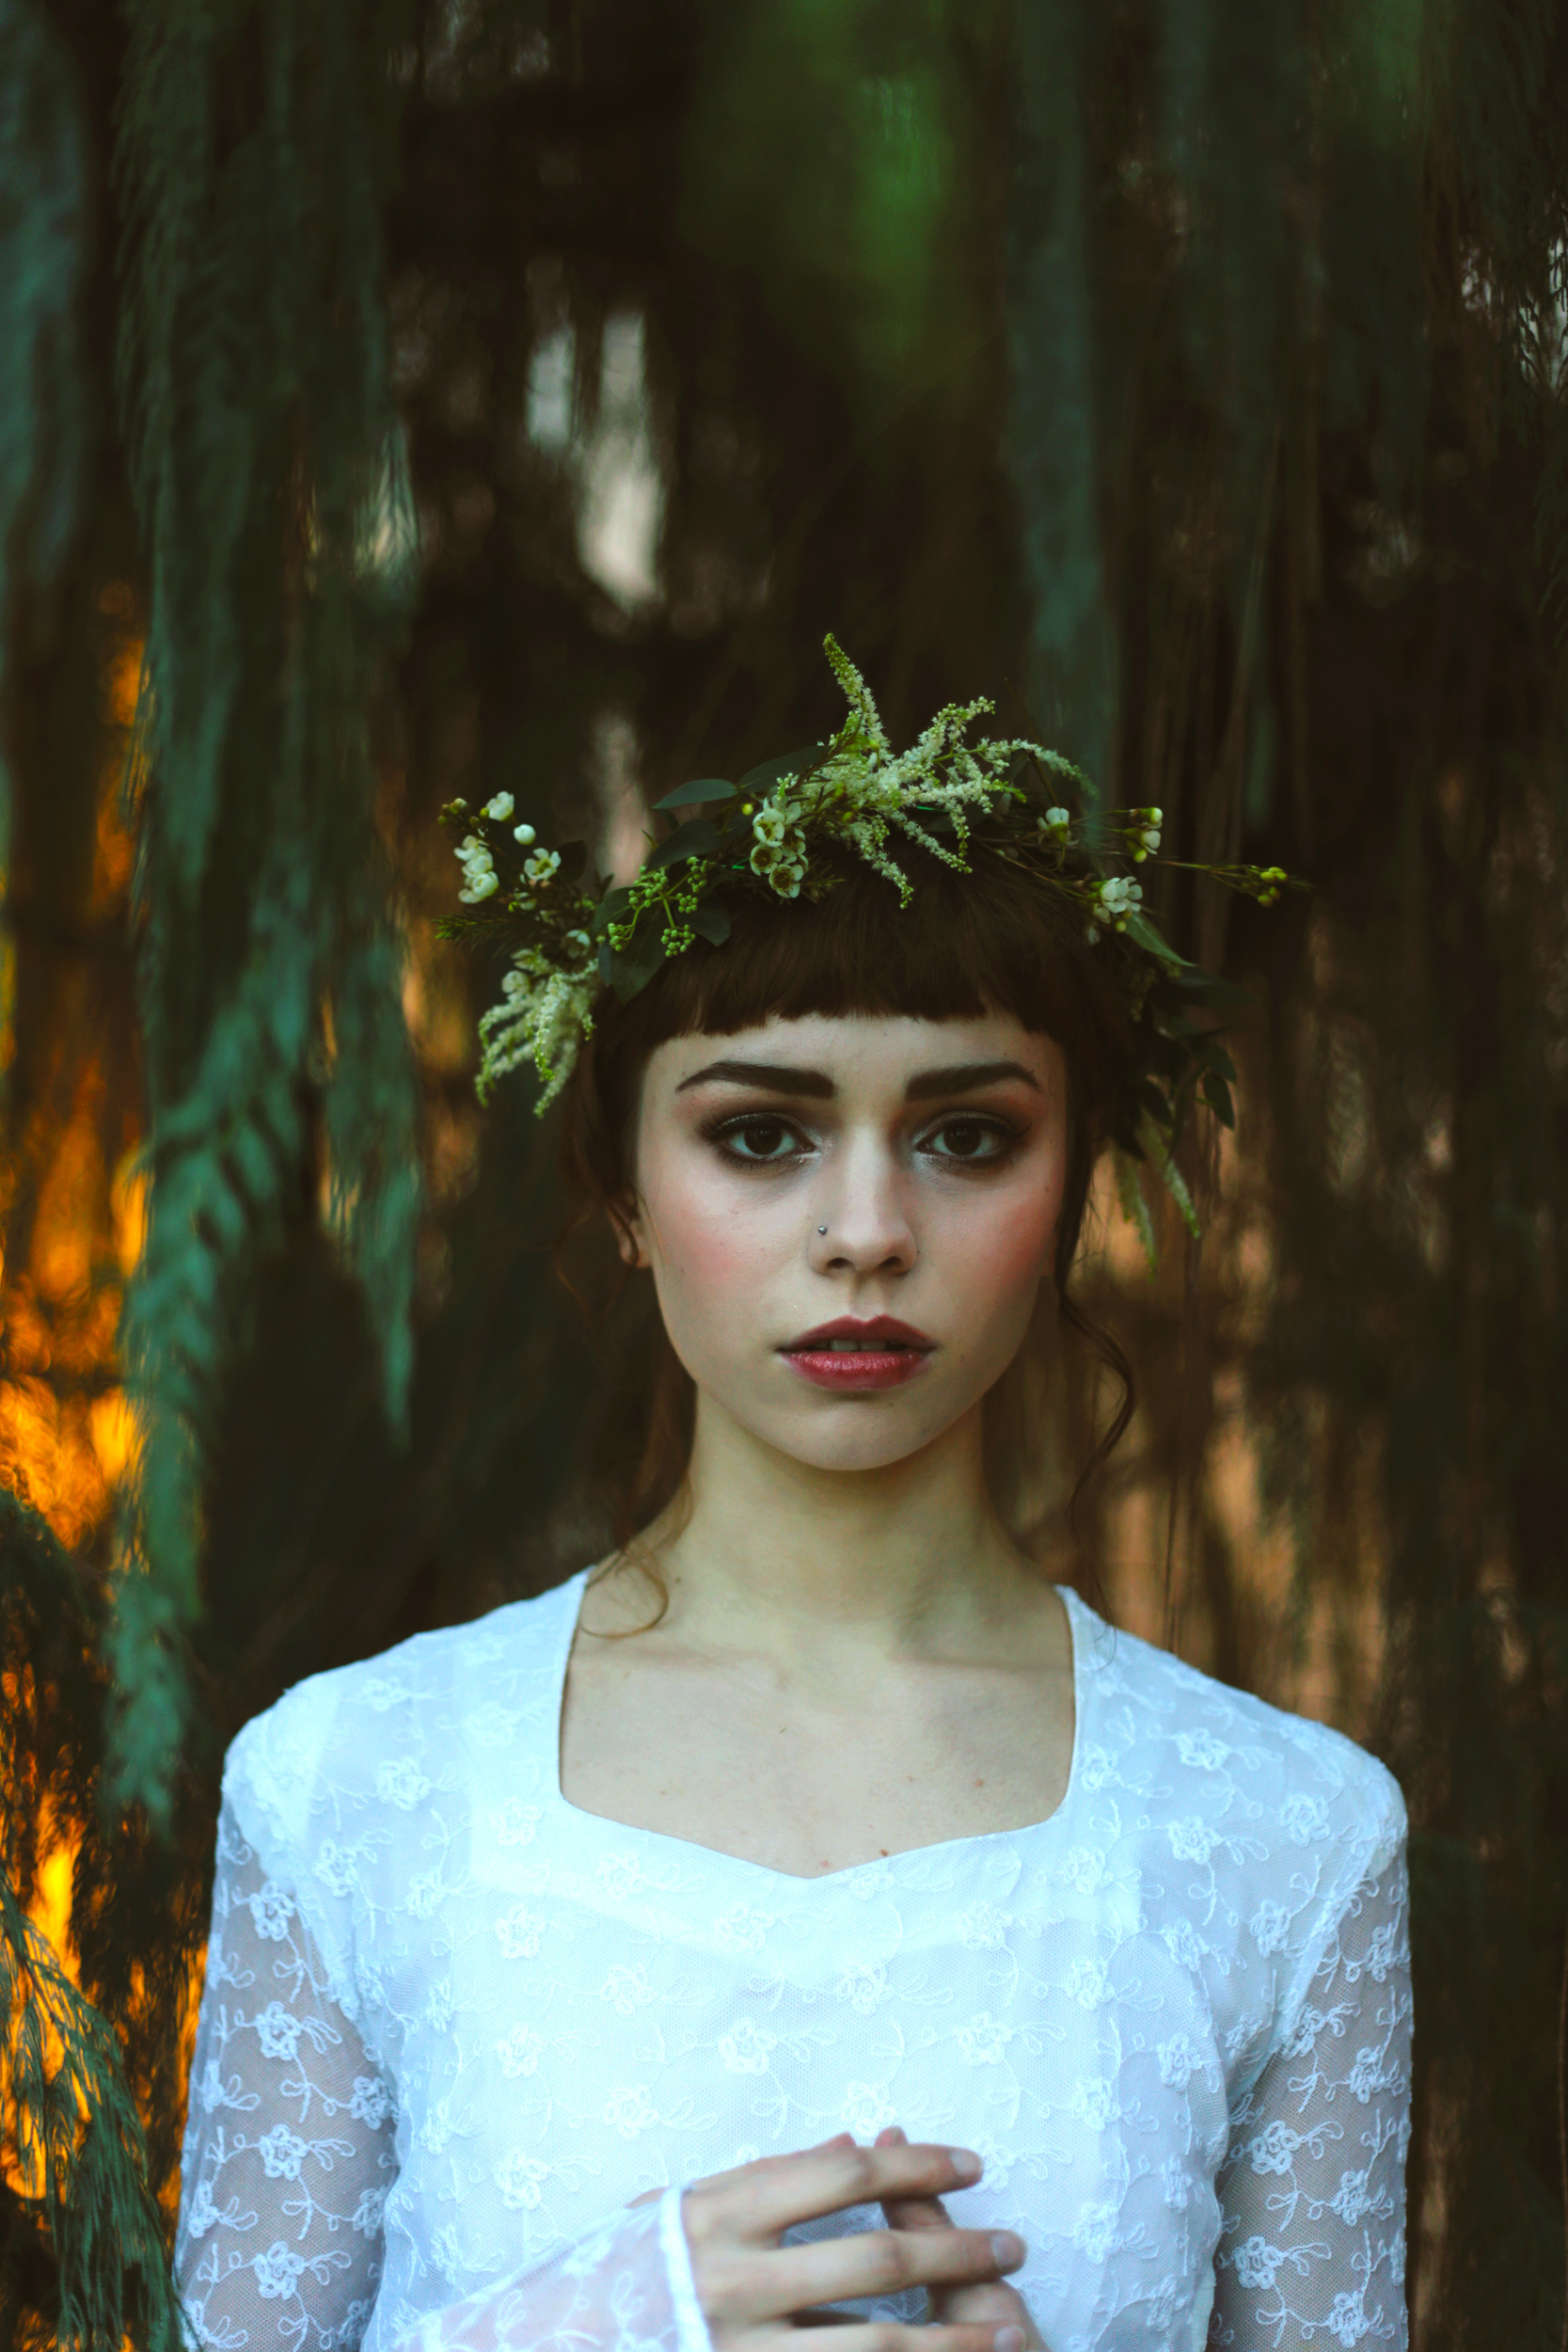 Winter-Bridal-Kate-Beaumont-Shelley-Richmond-Vintage-Wedding-Dress-23.jpg